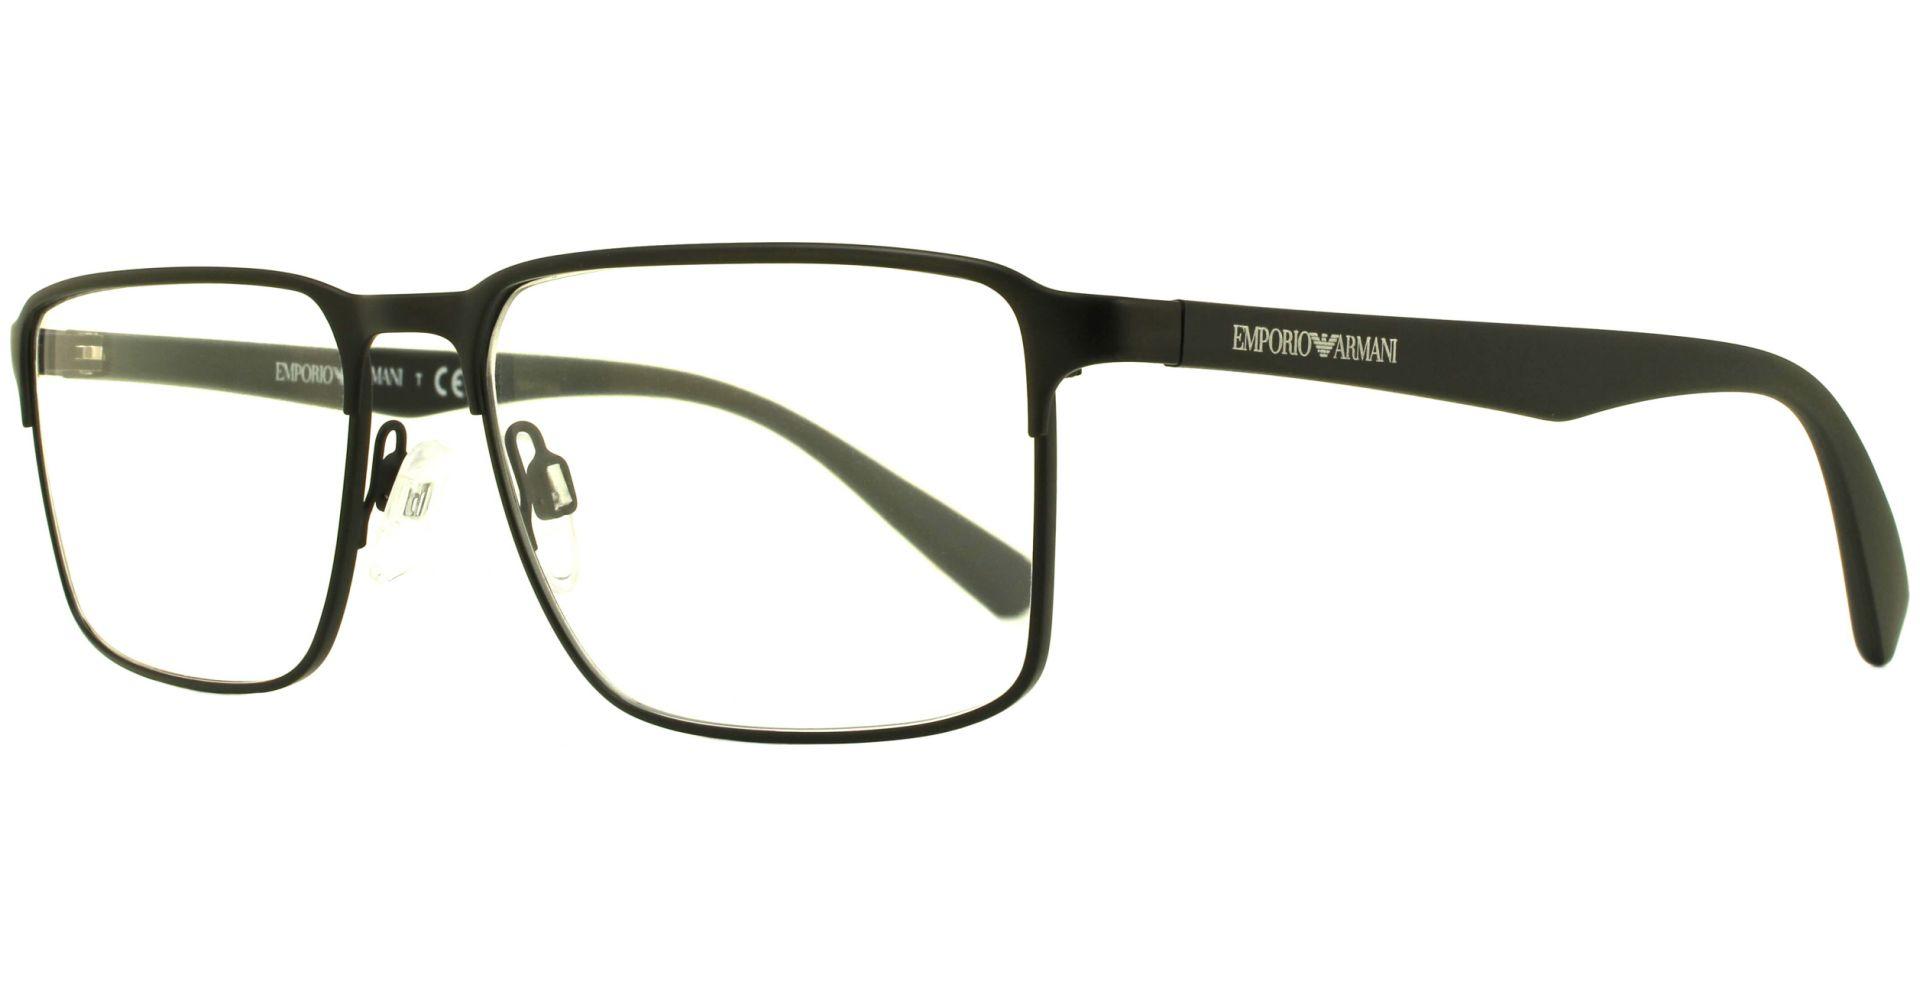 Emporio Armani - EA1046 3001 5517 Matte Black - von Lensbest